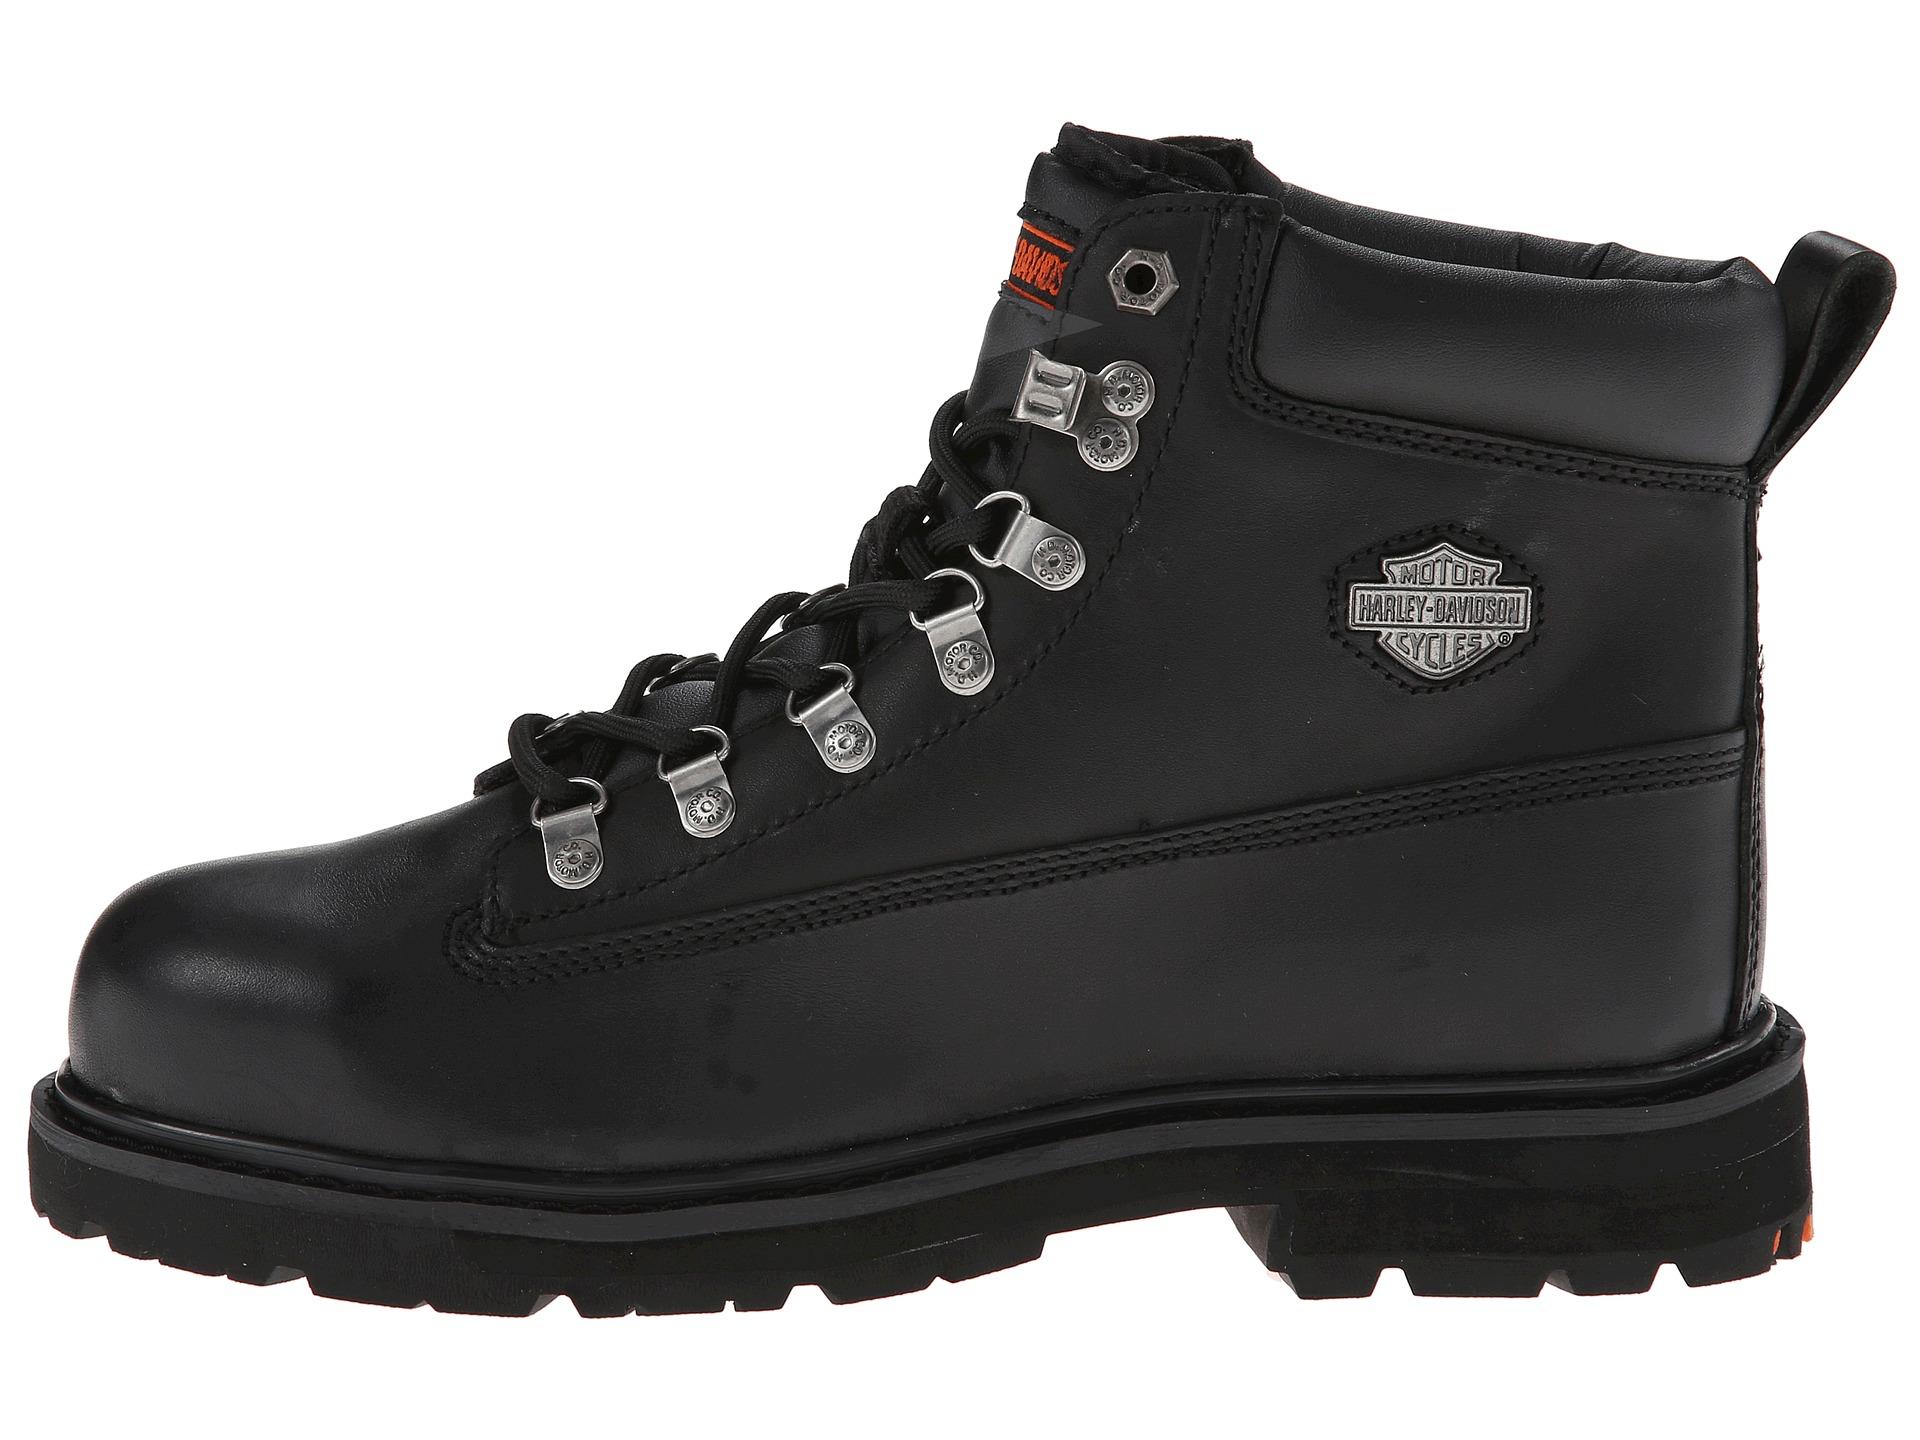 Zappos Steel Toe Shoes For Women